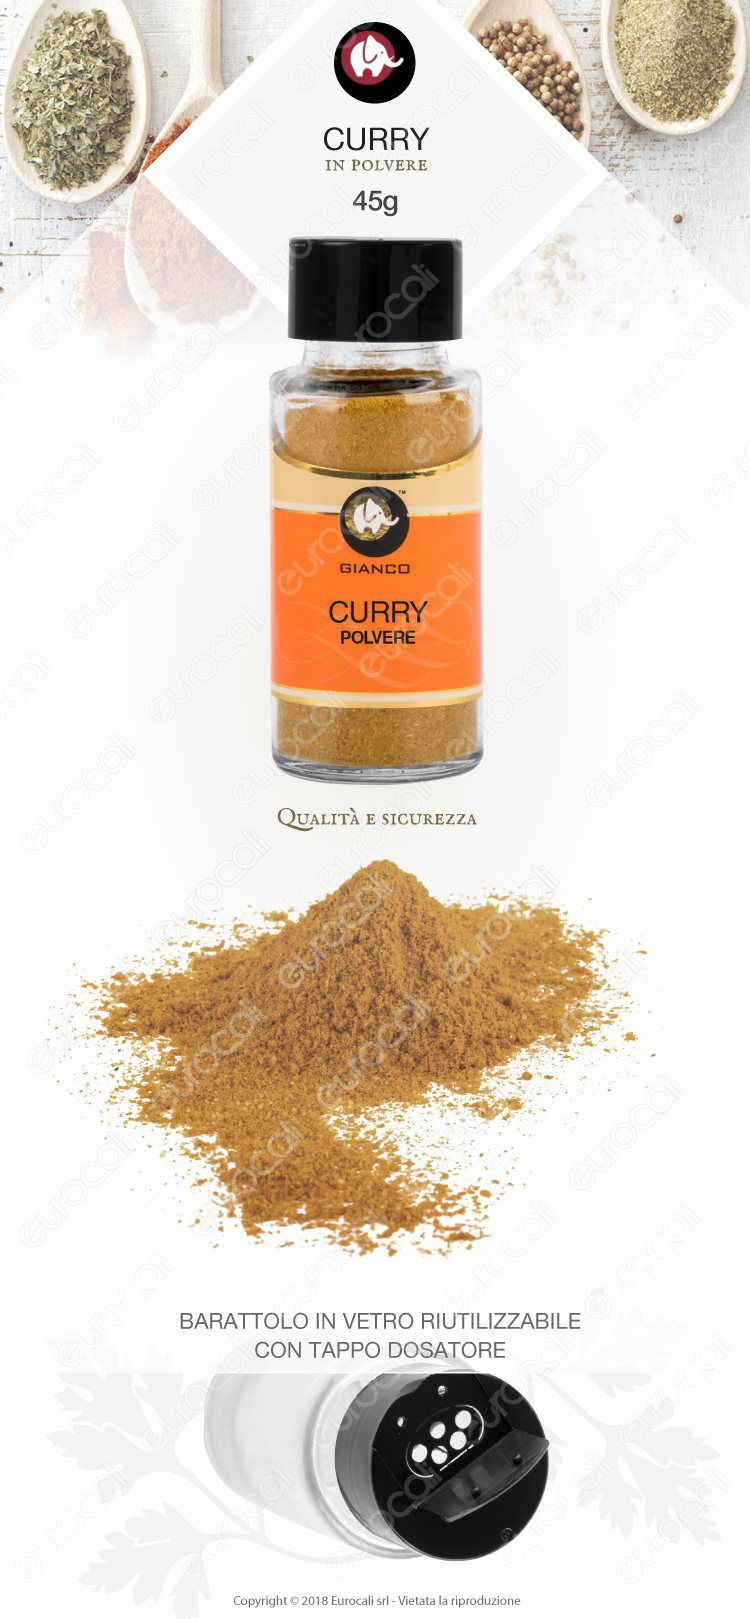 Gianco Curry Polvere